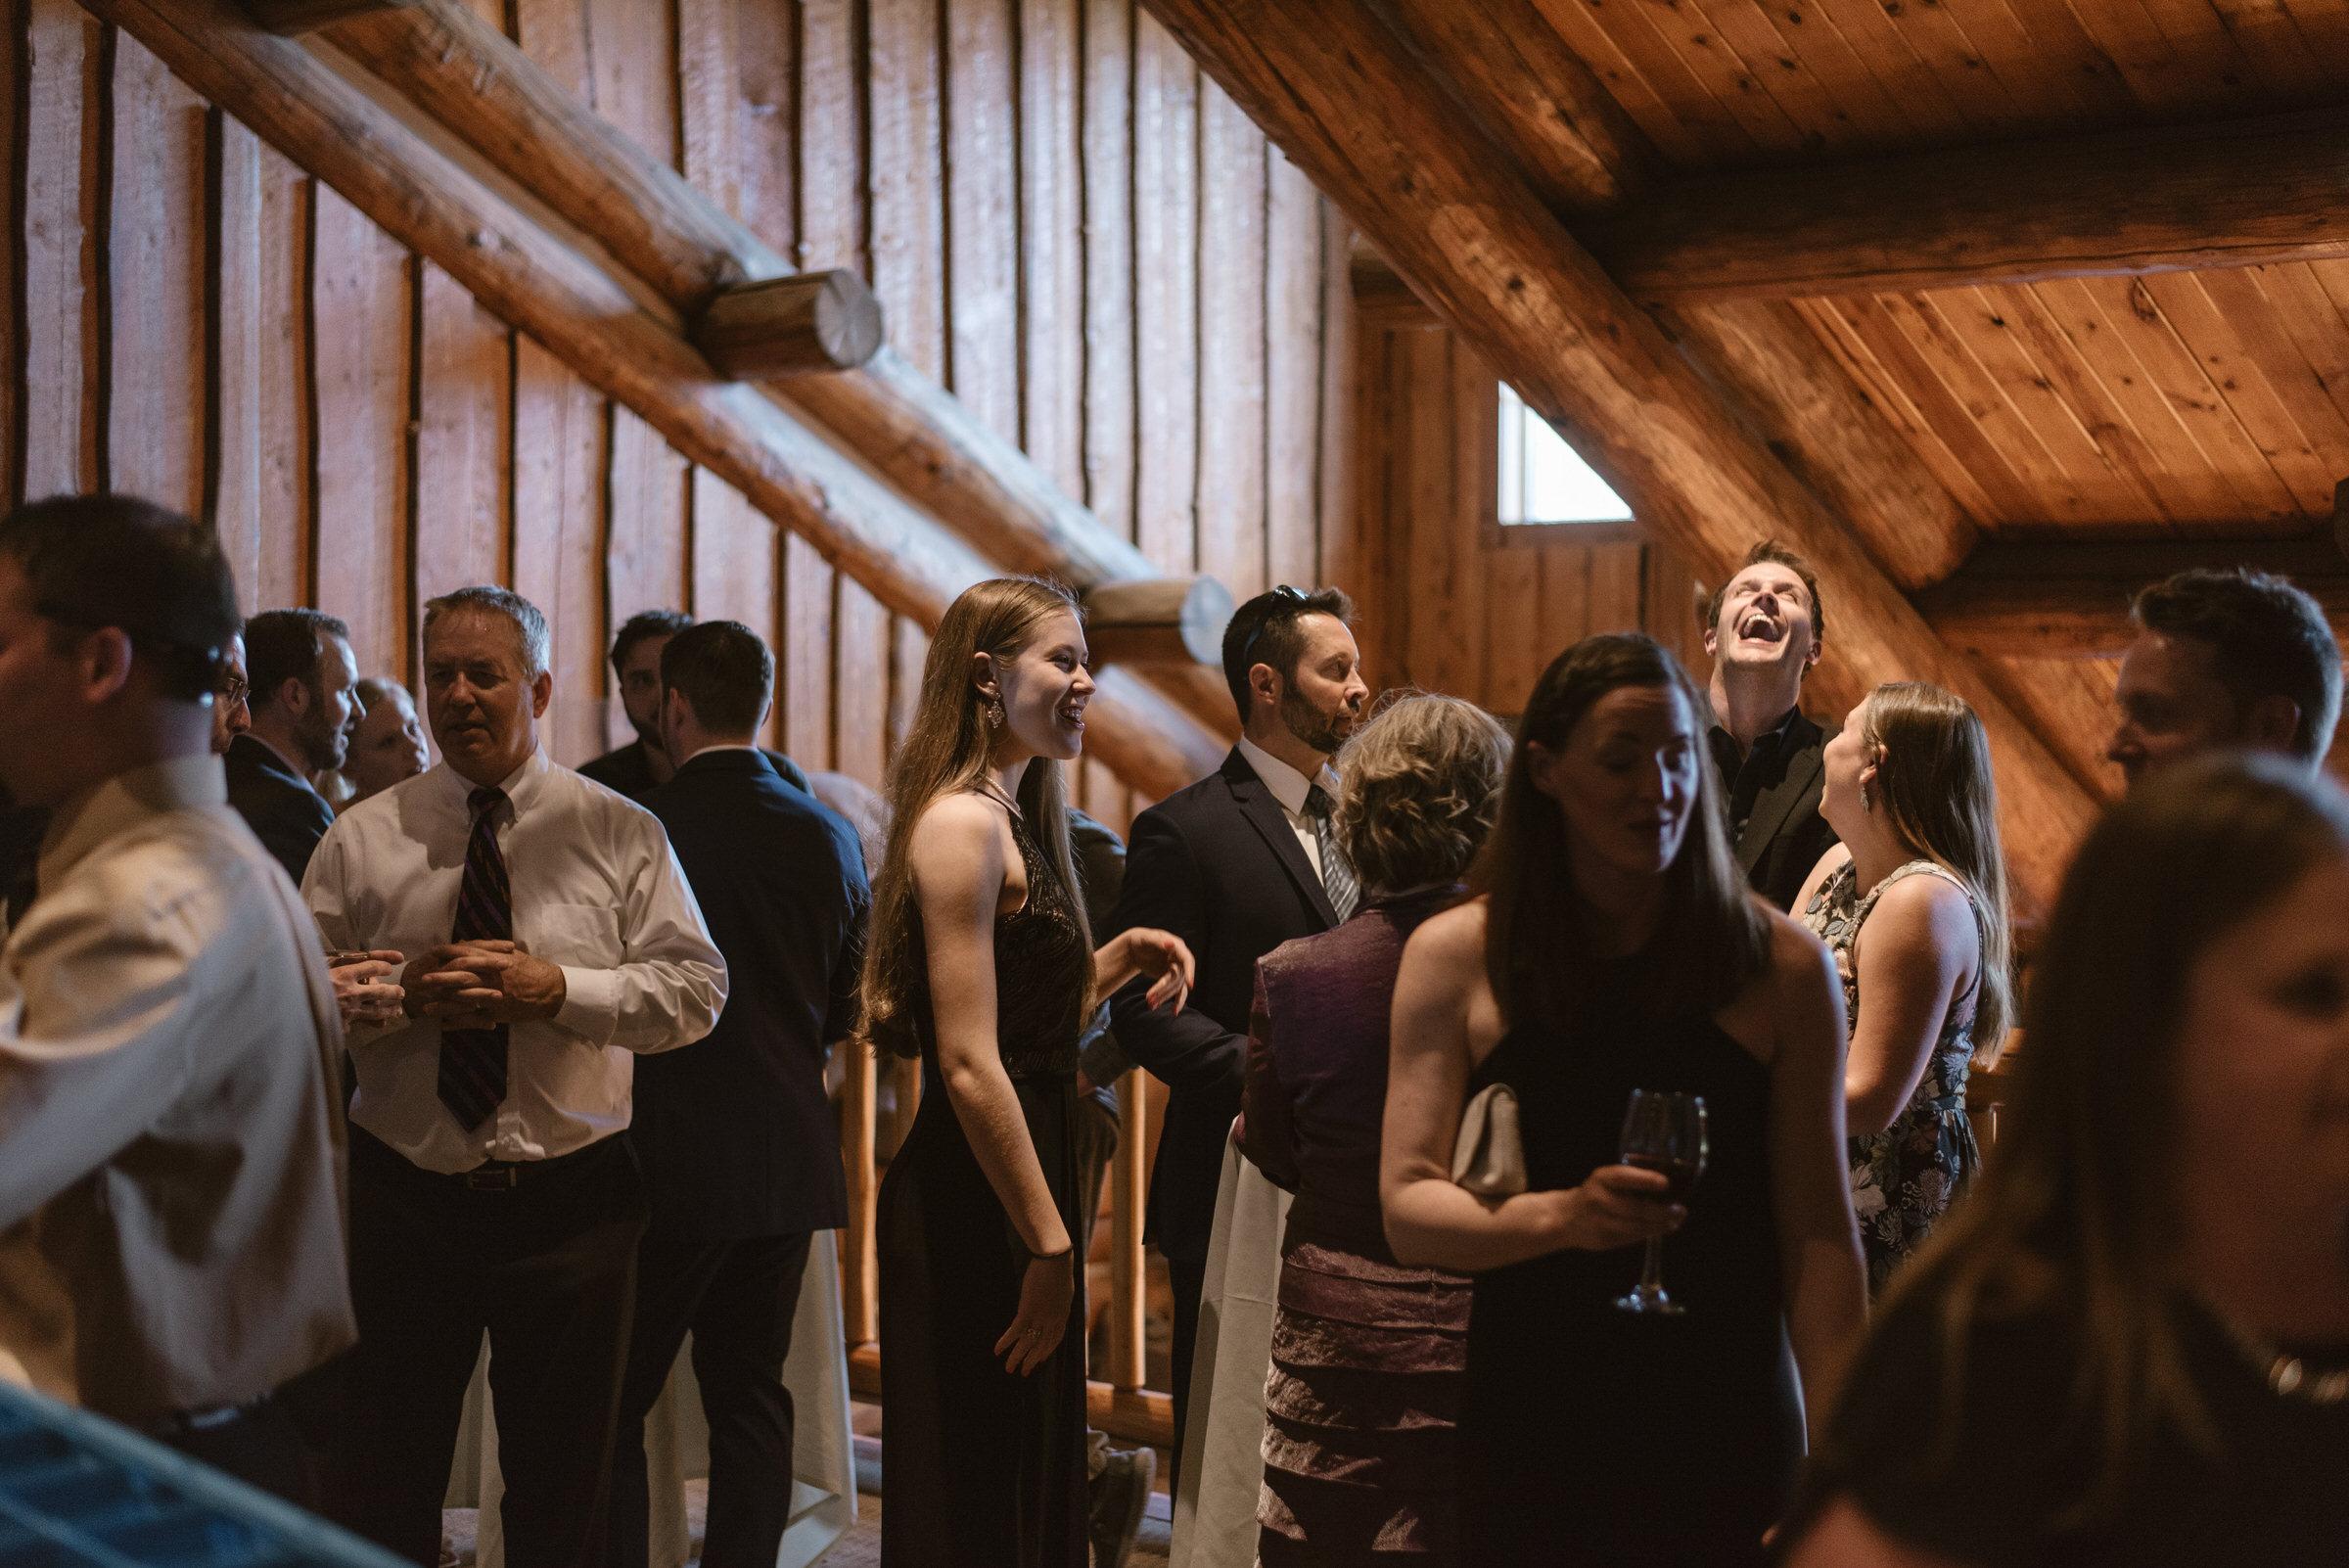 Wilderness-Ridge-Lincoln-Nebraska-Wedding-Kaylie-Sirek-Photography-088.jpg